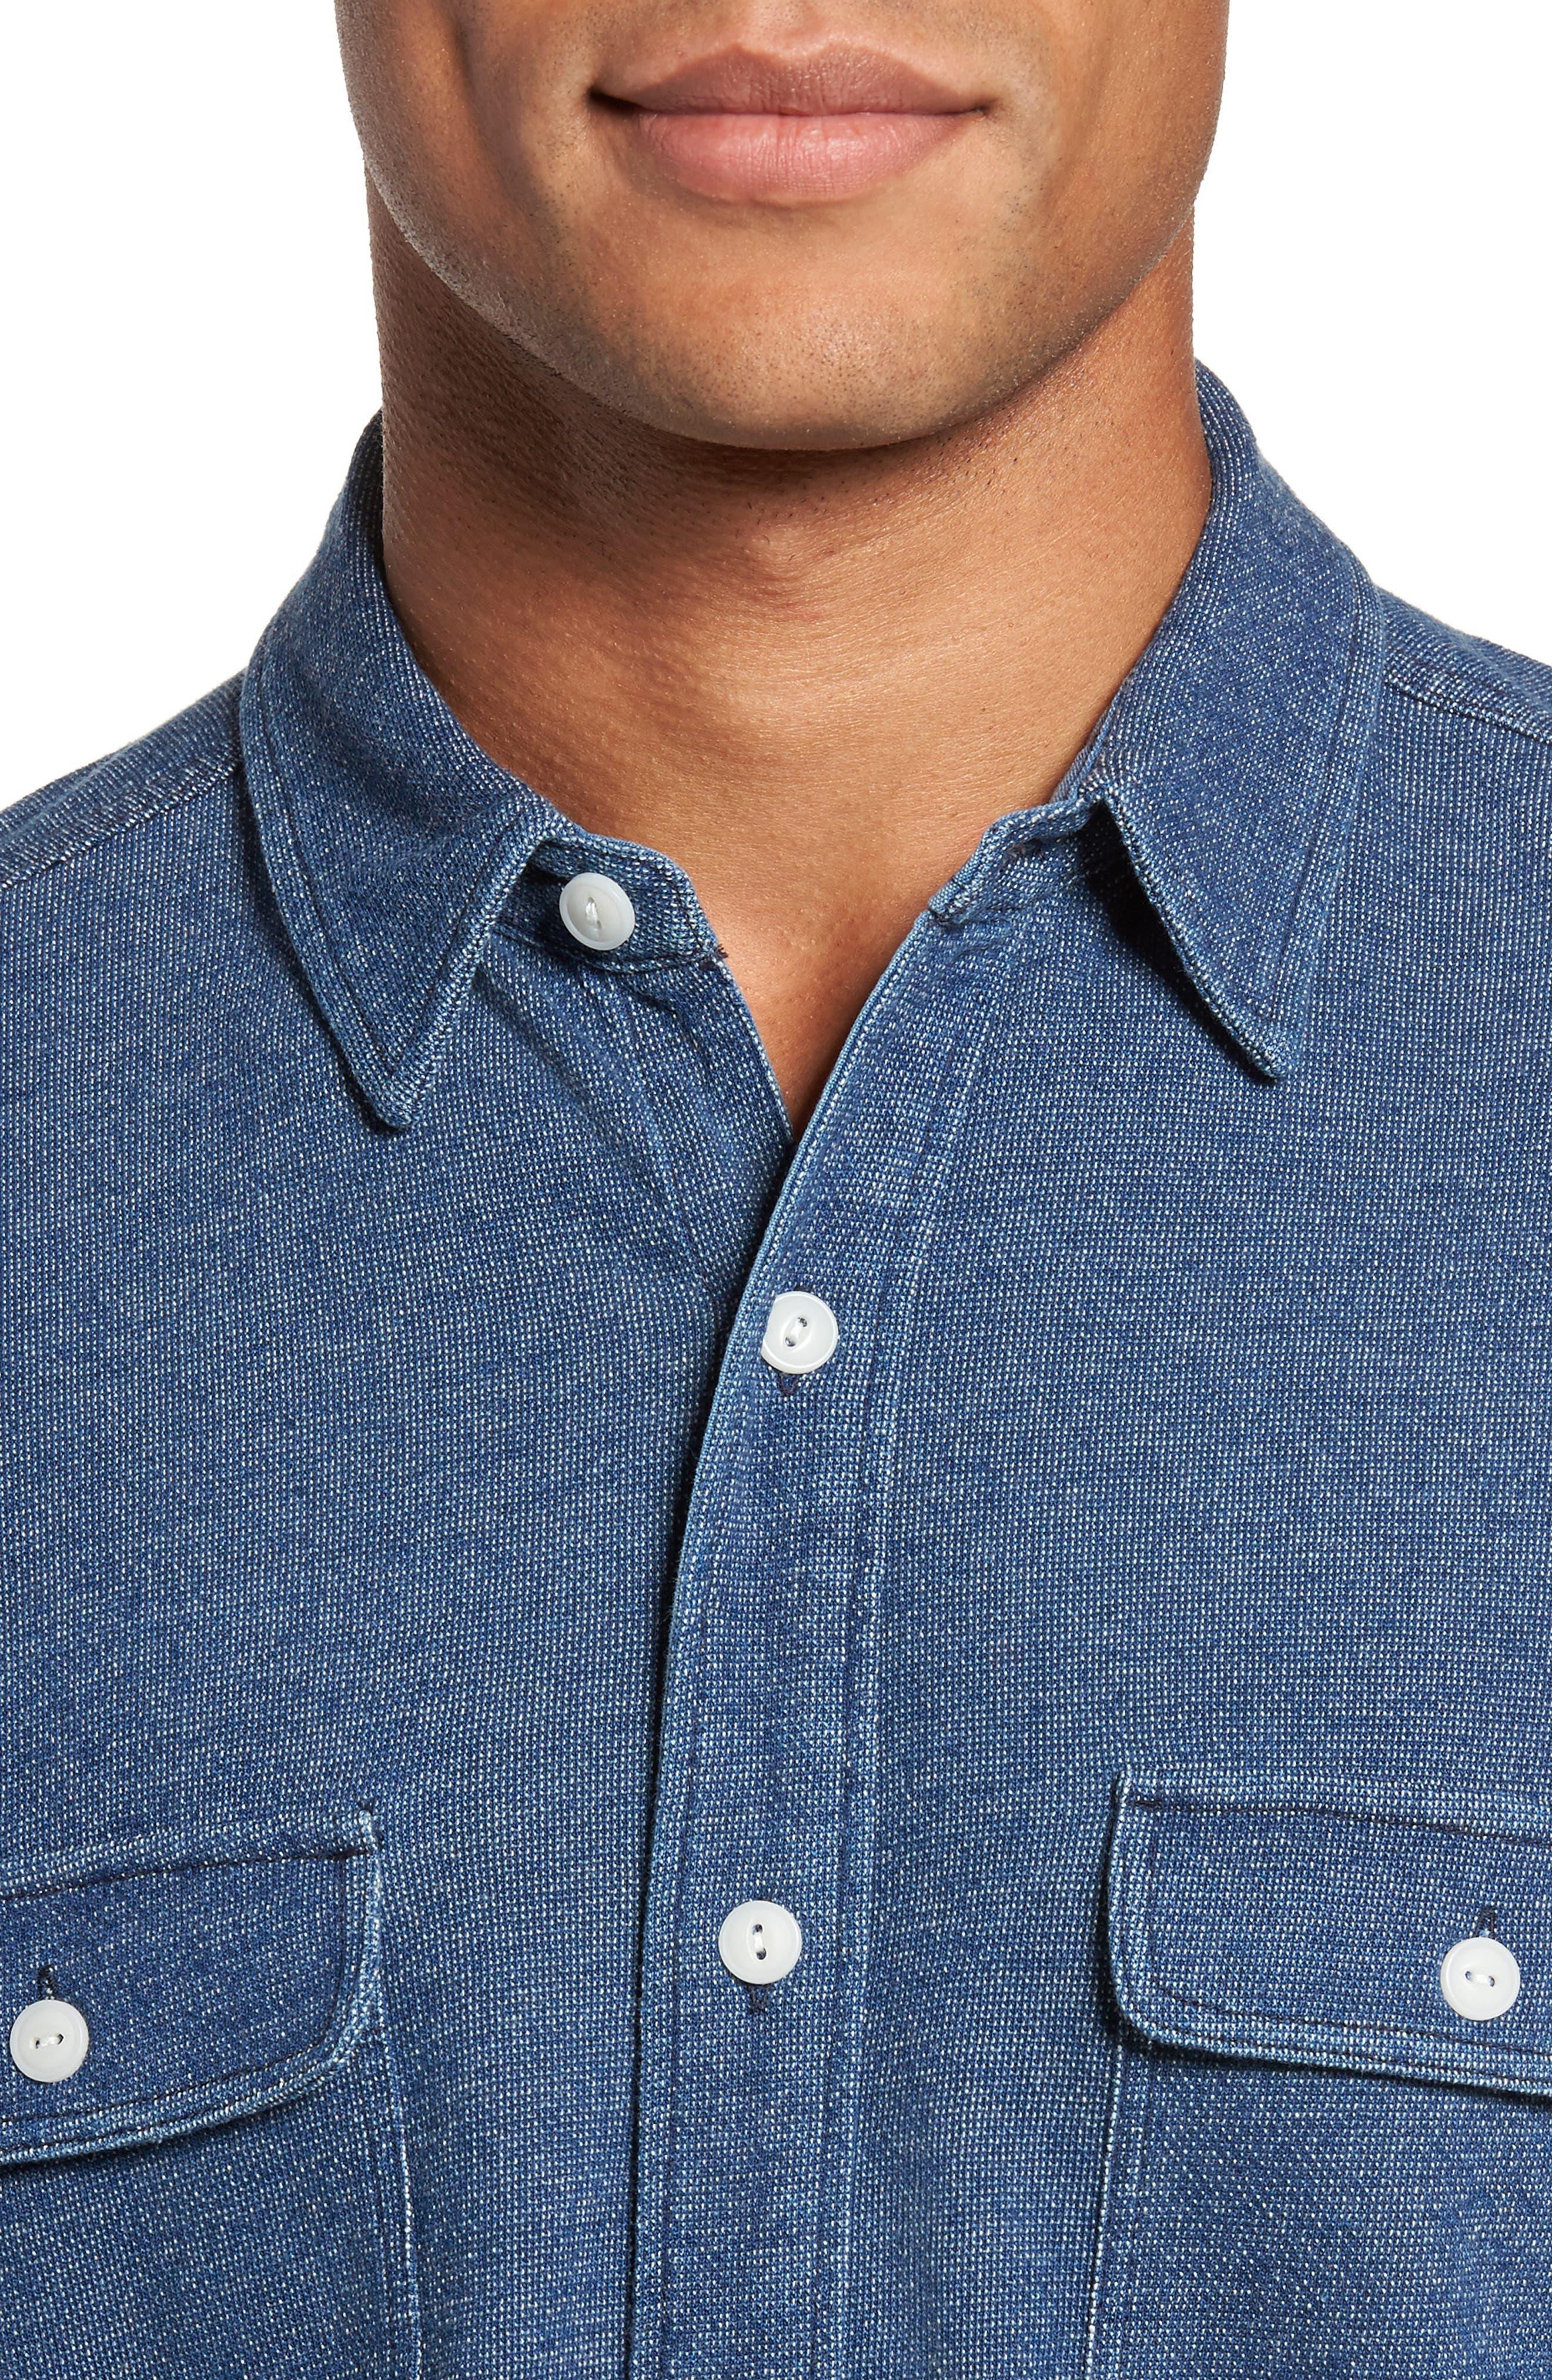 Belmar Knit Sport Shirt,                             Alternate thumbnail 4, color,                             404